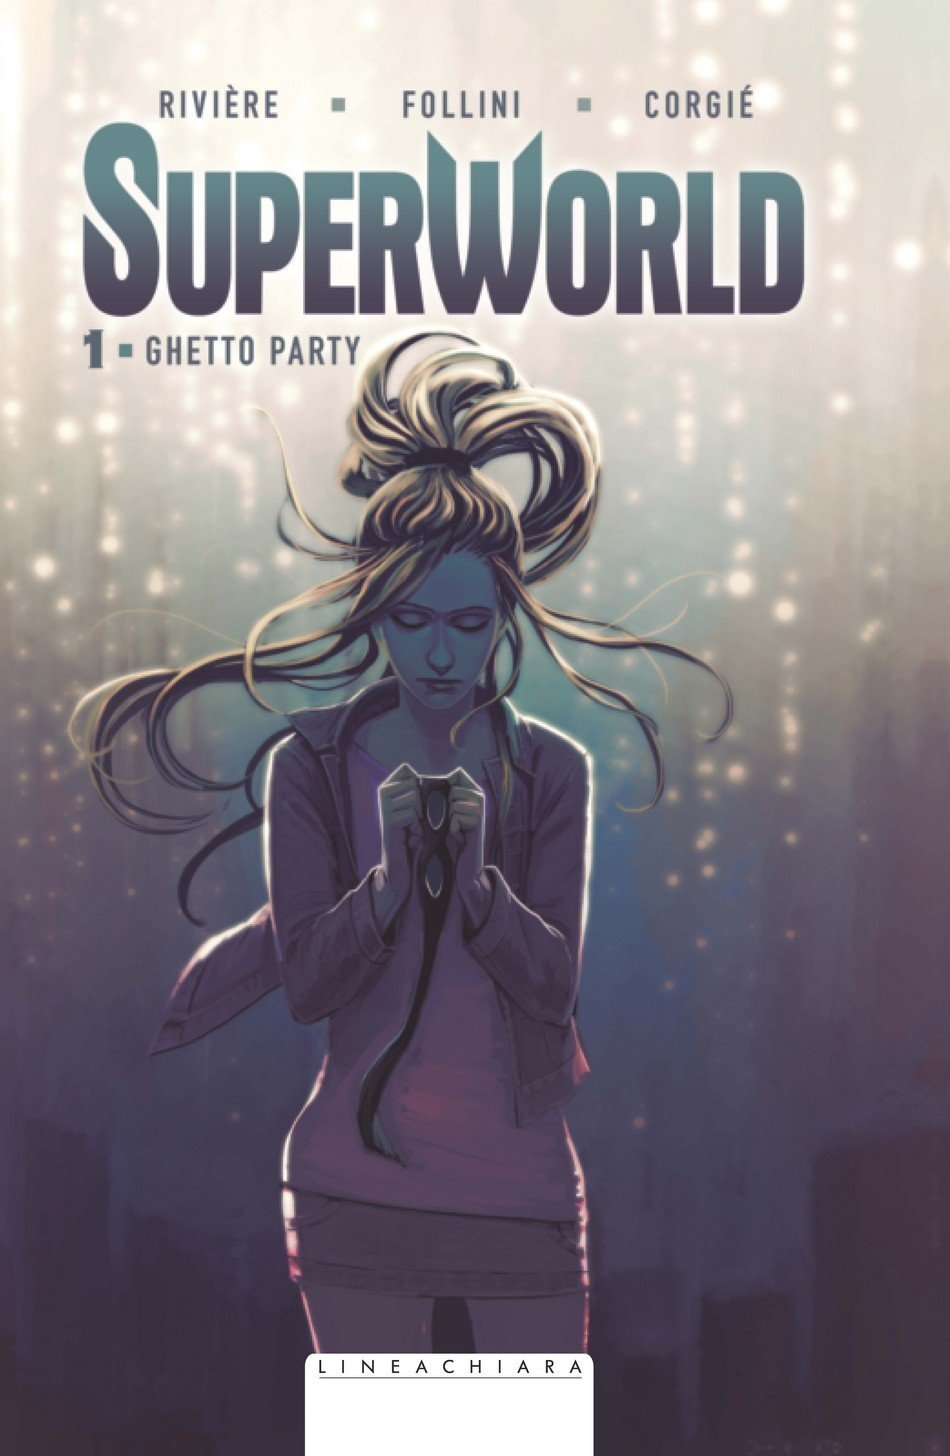 SUPERWORLD - COPERTINA